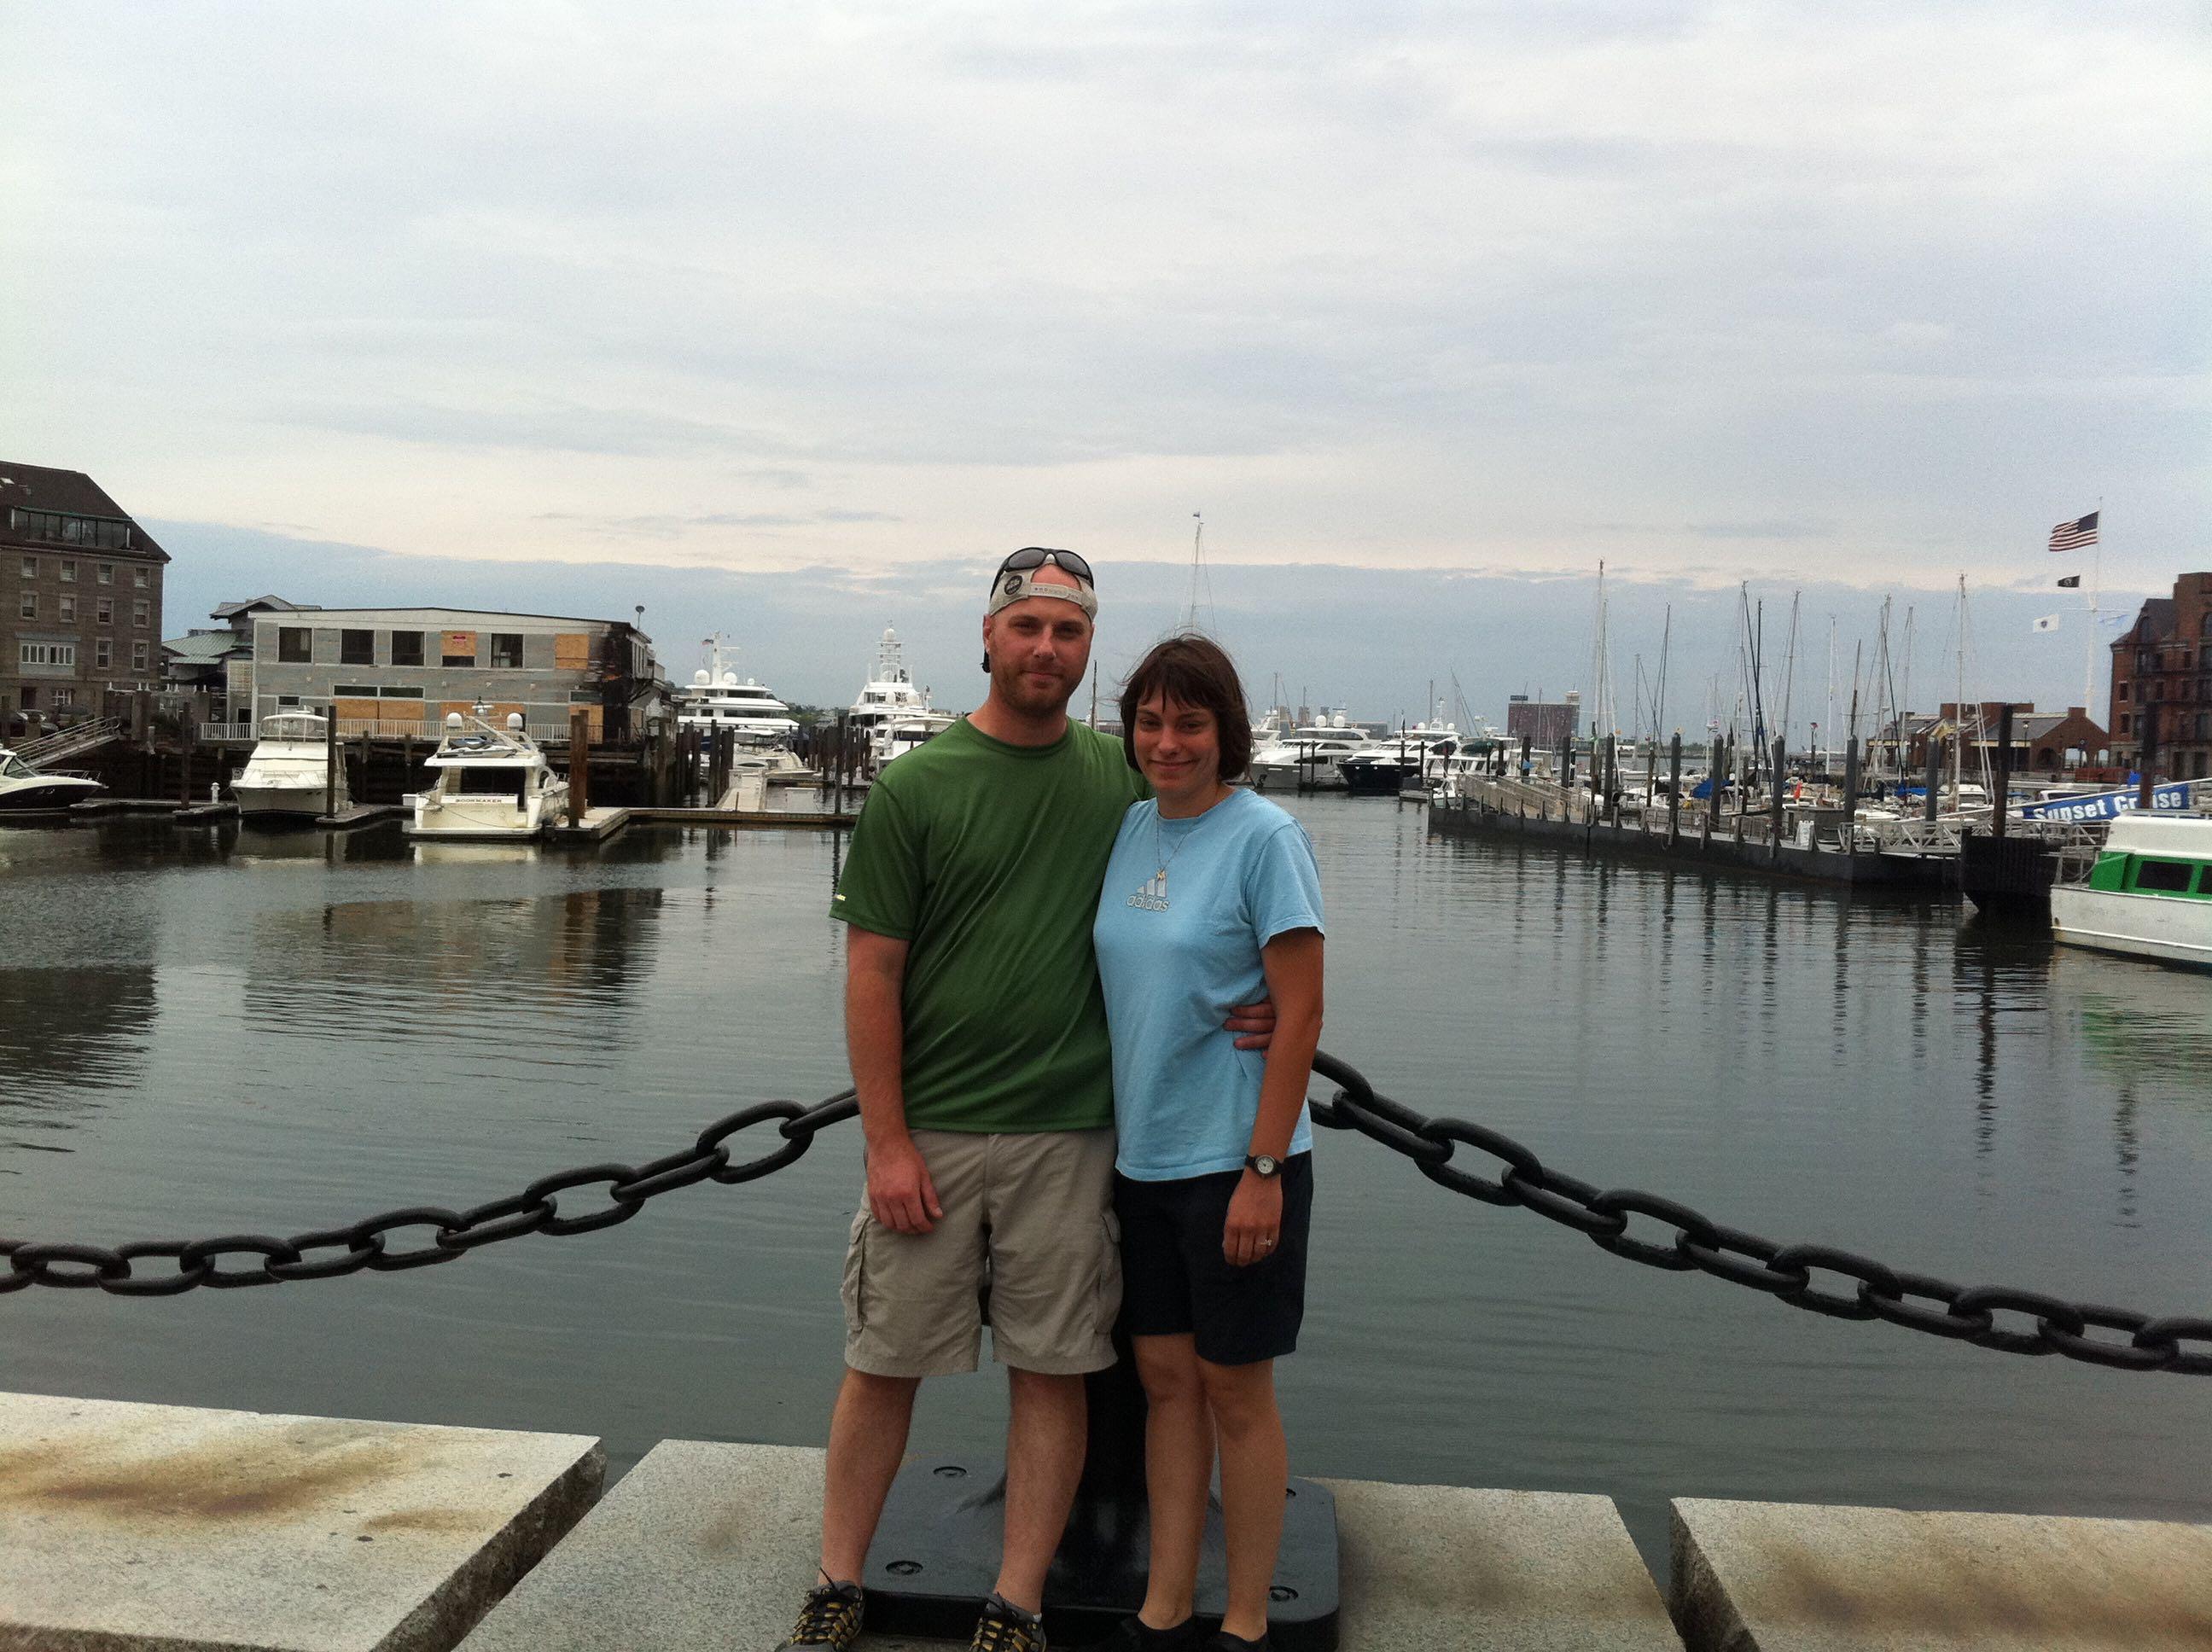 Kevin Lucin & Trish Grant